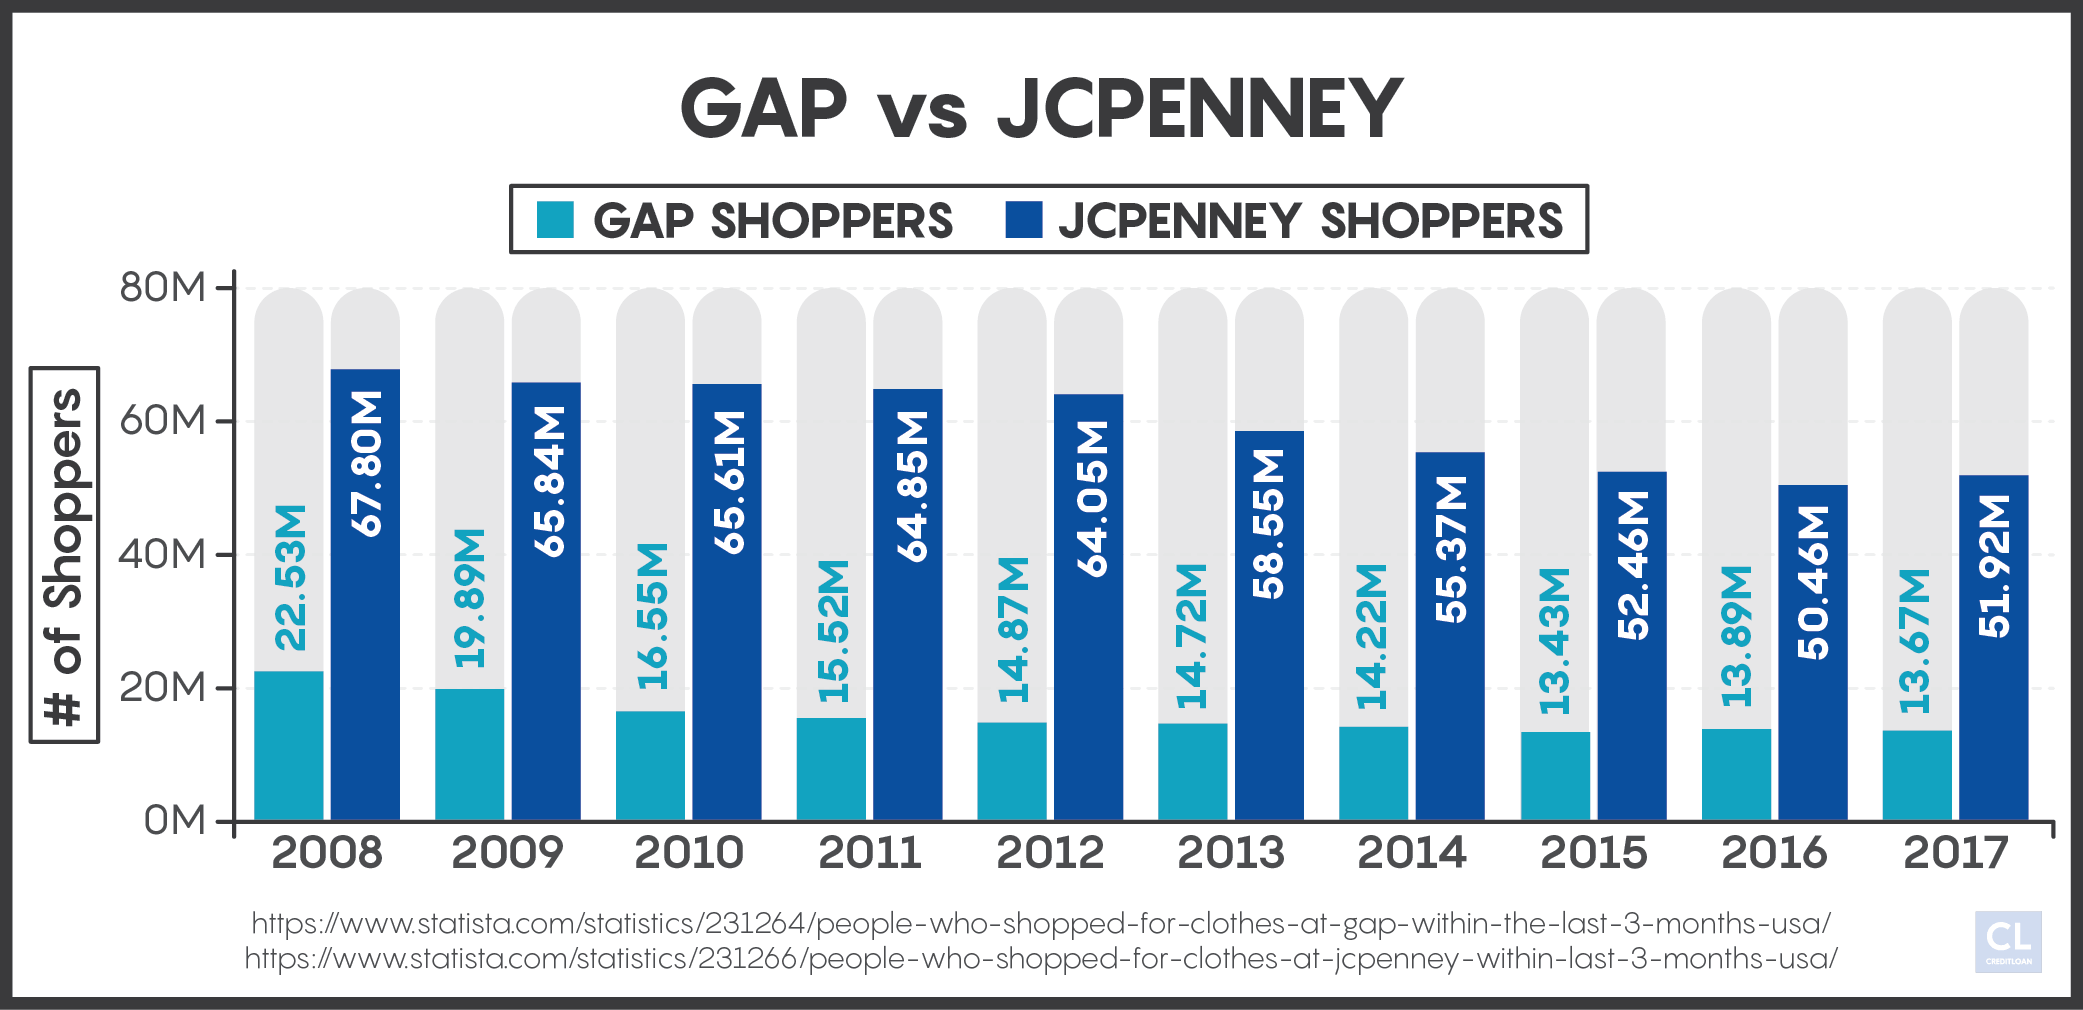 Gap shoppers vs JcPenny shoppers